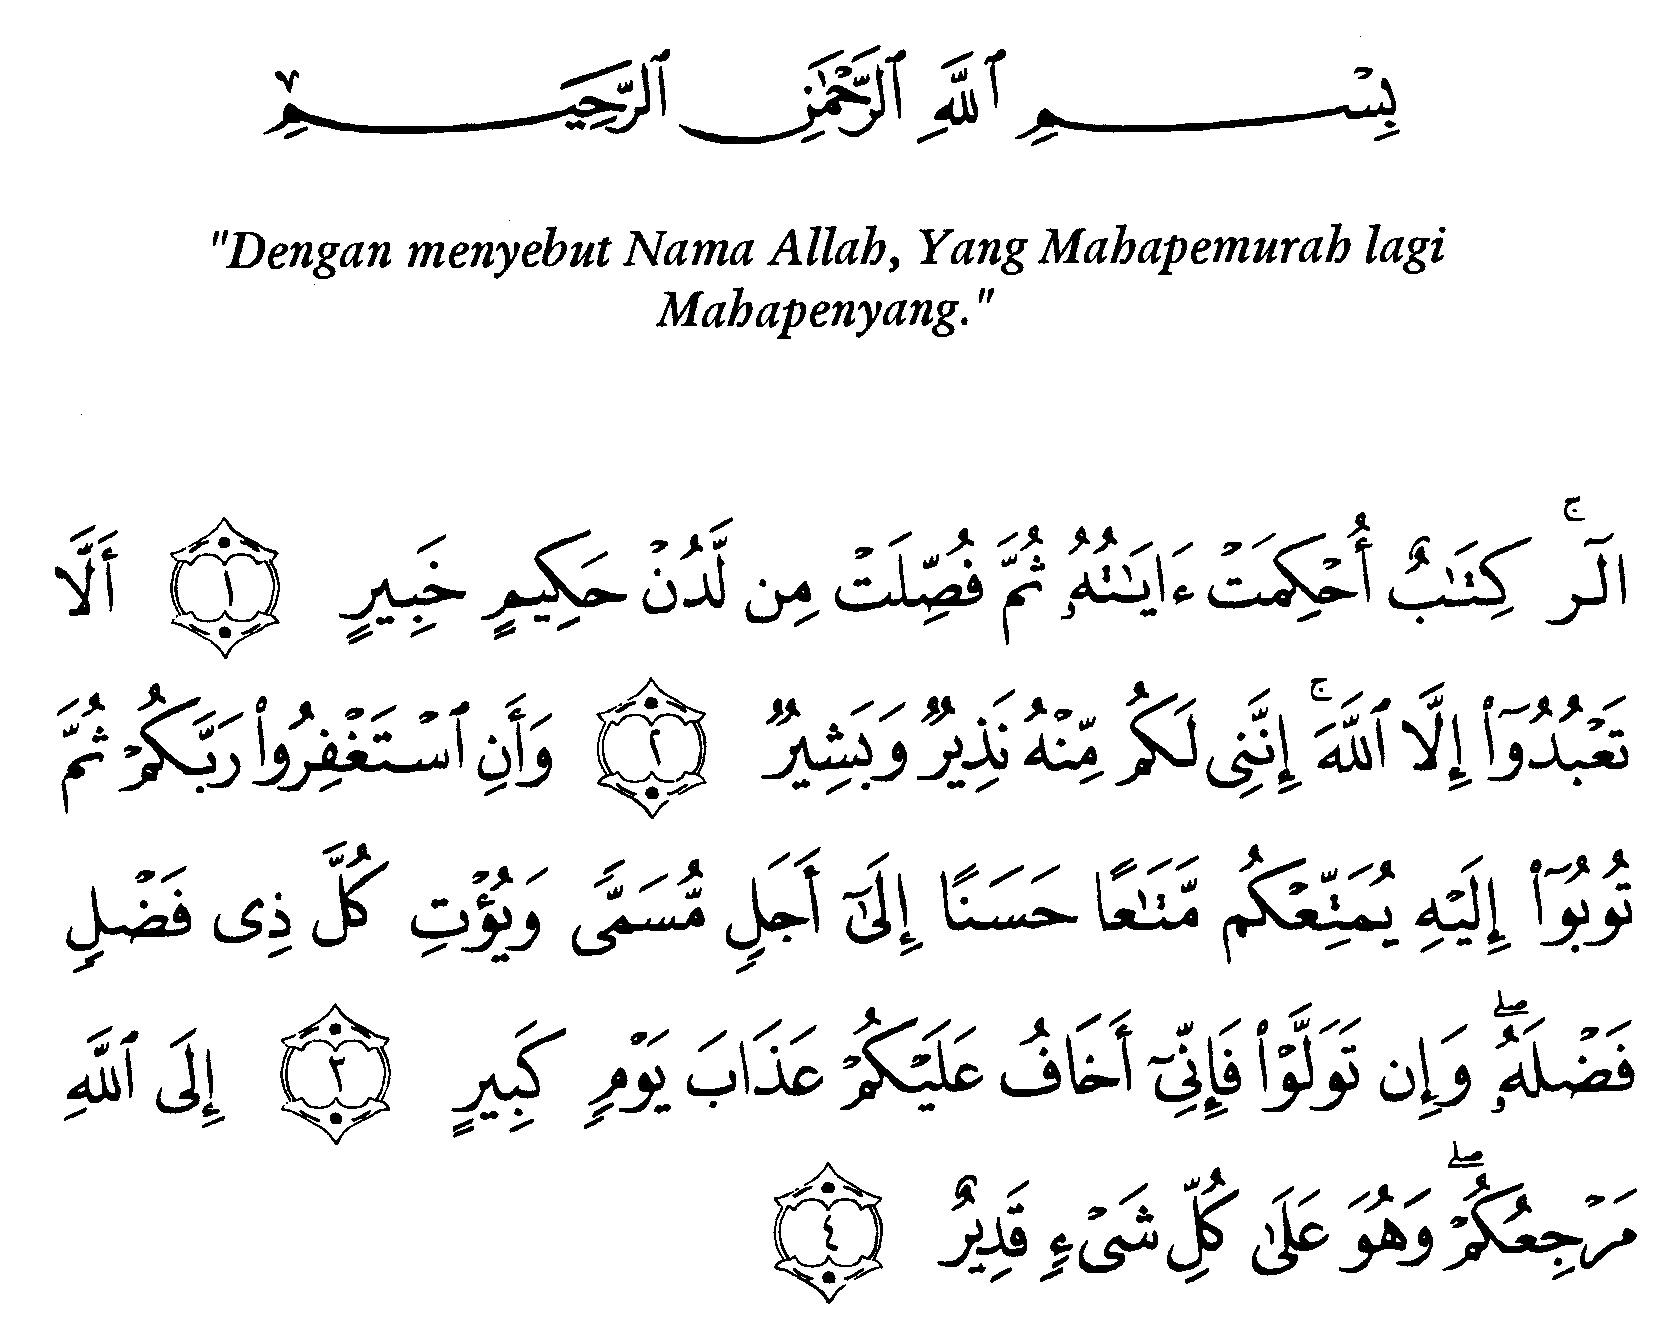 Tafsir Al Quran Alquranmulia Laman 58